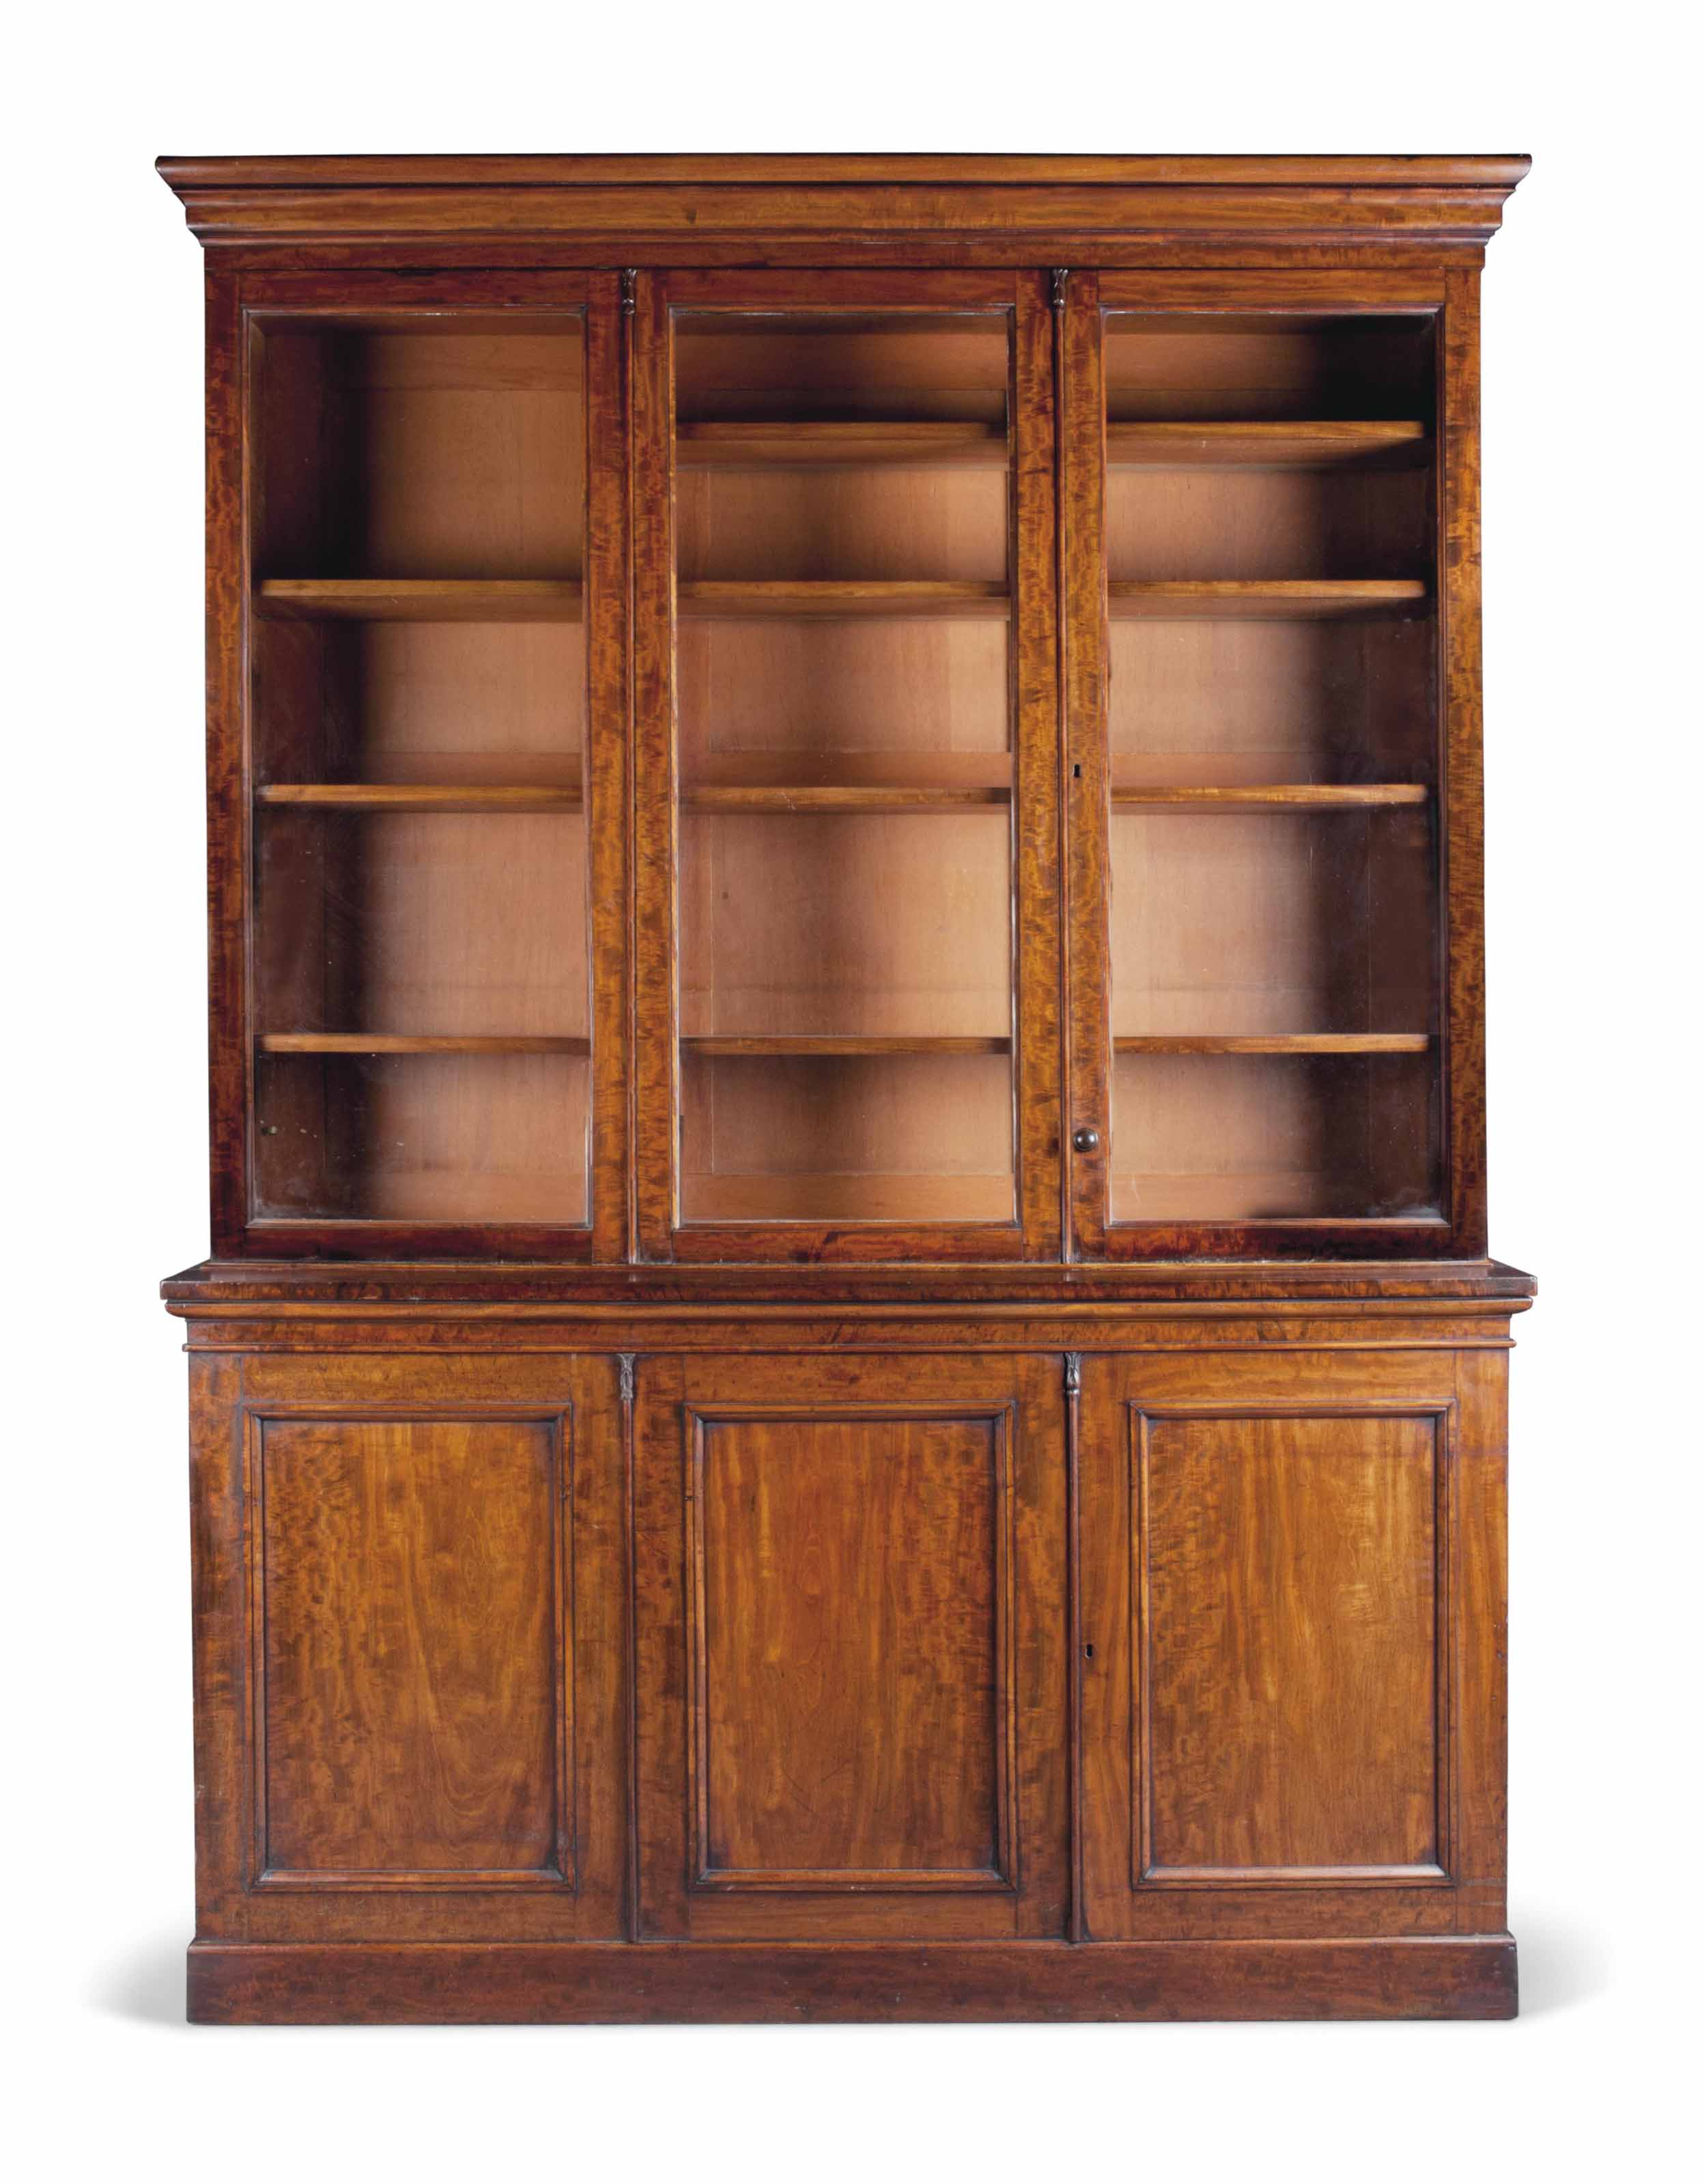 A Victorian Mahogany Bookcase Third Quarter 19th Century